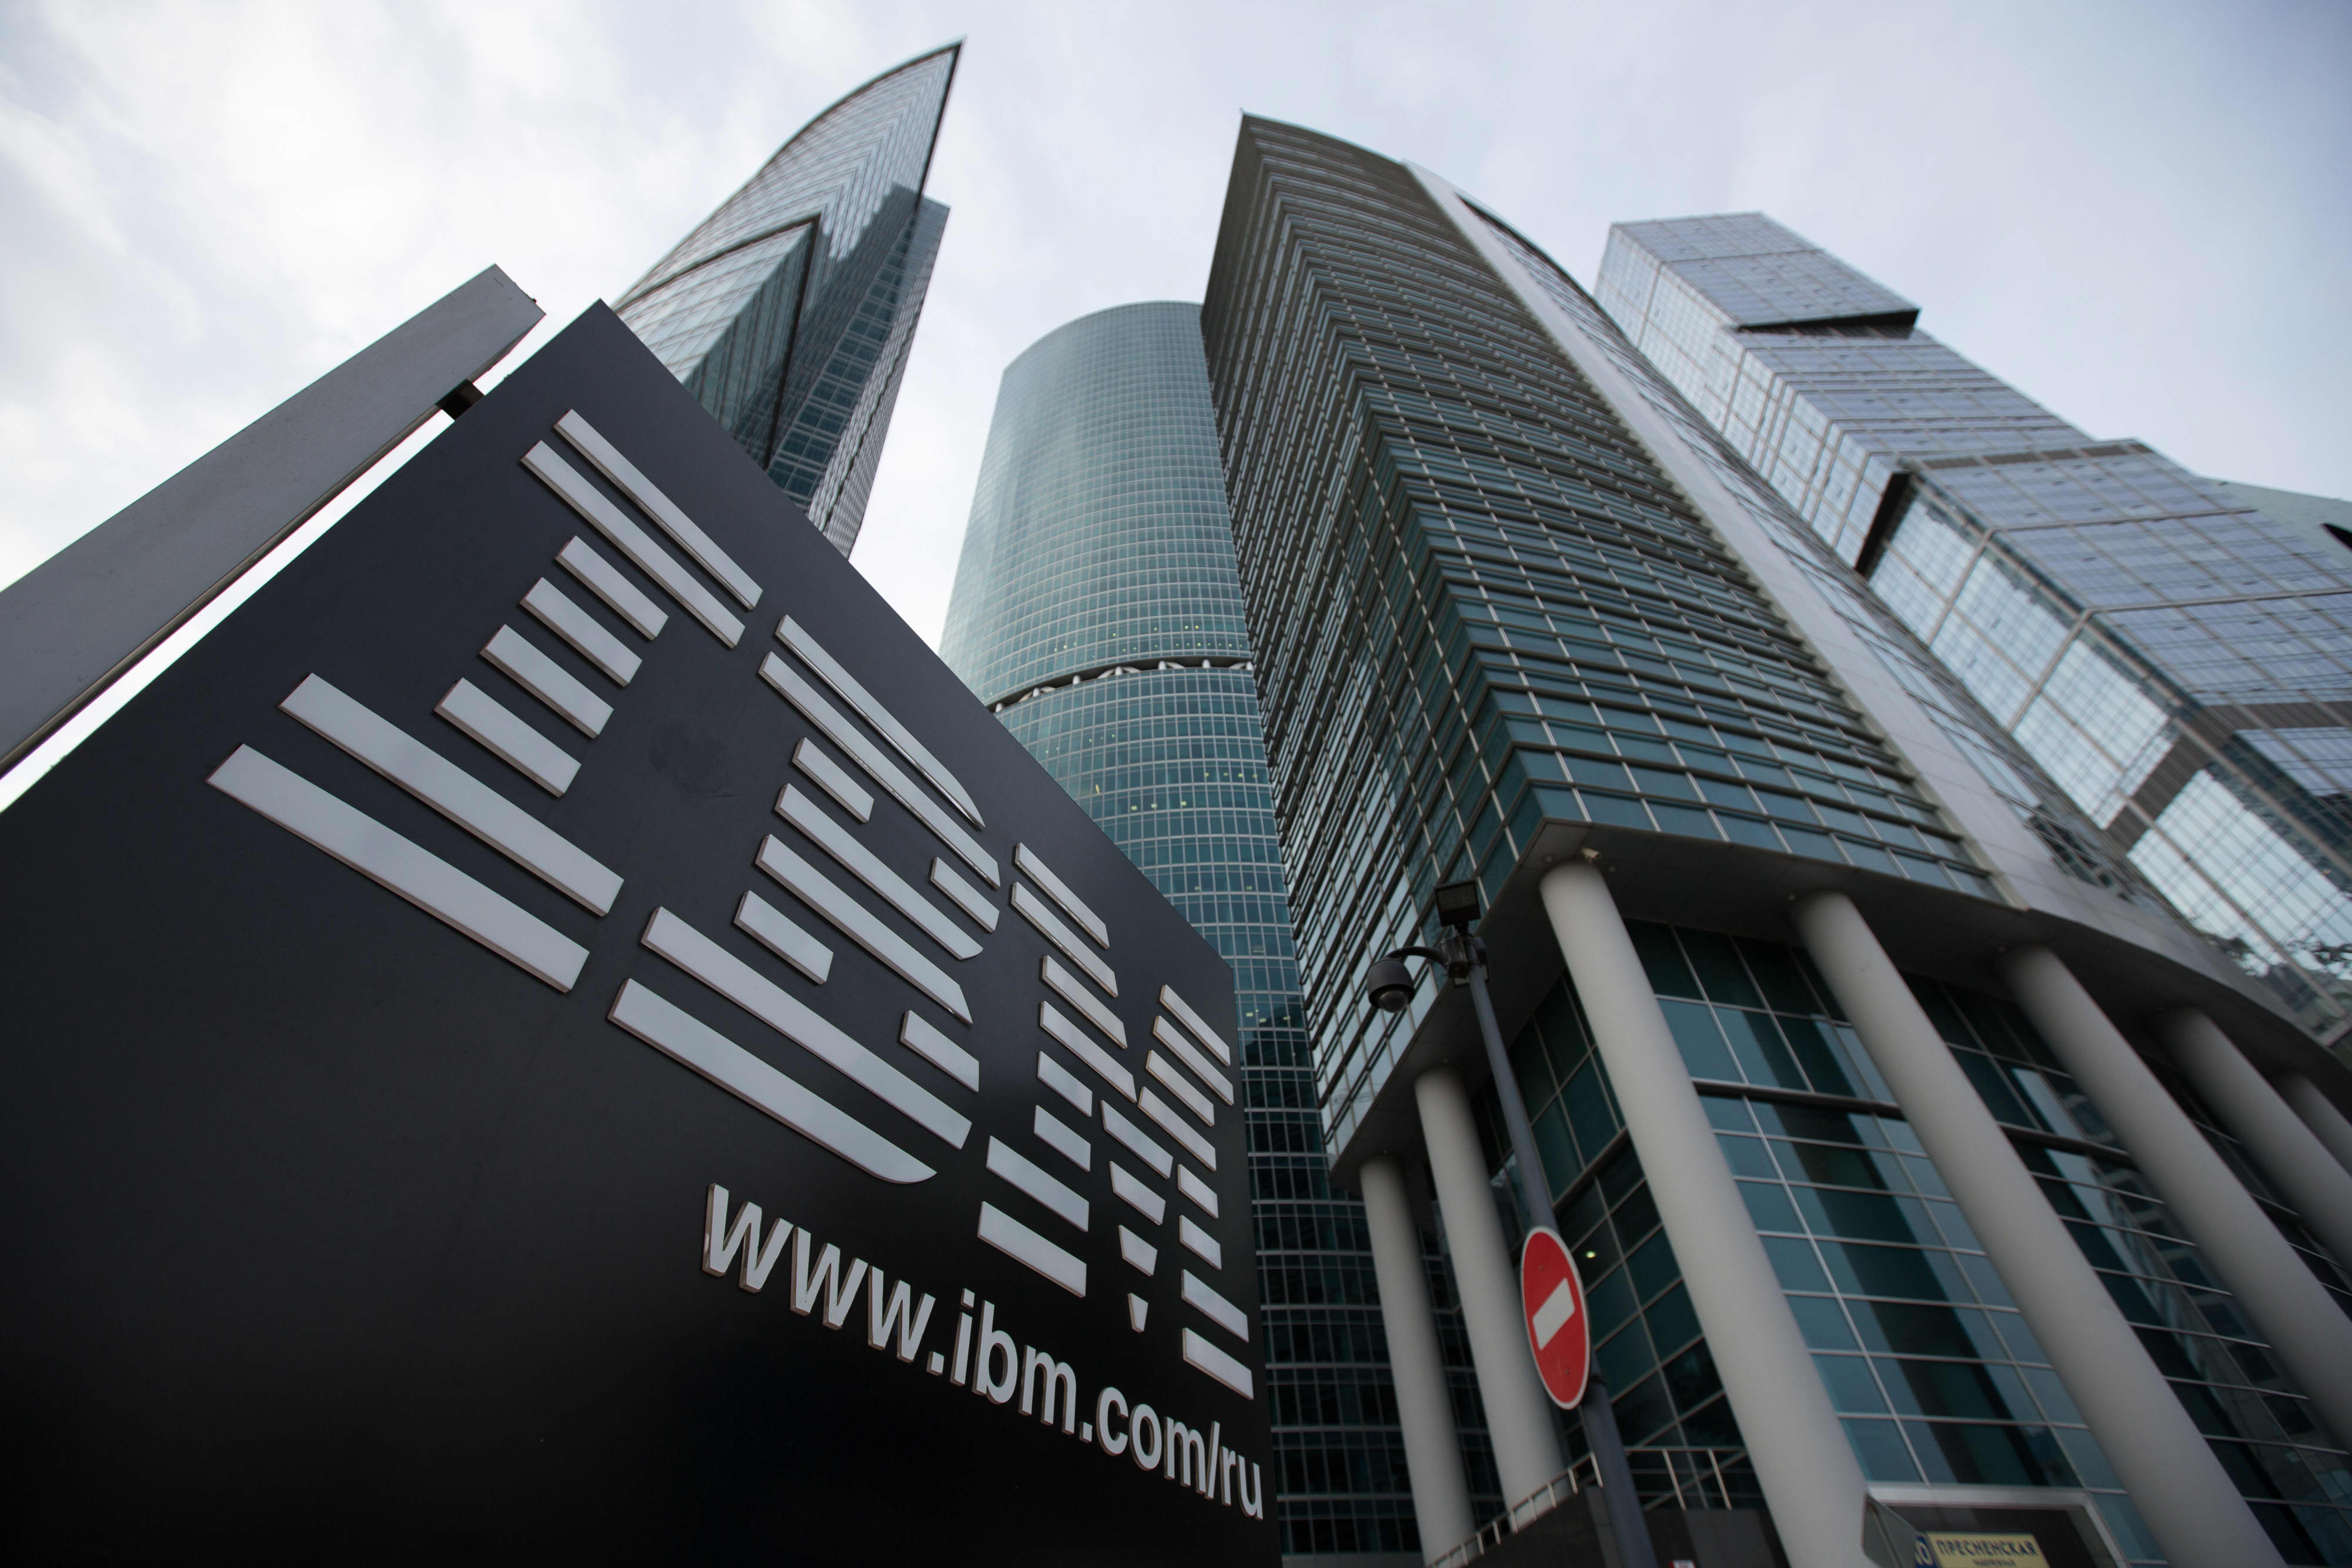 ibm international business machines essay